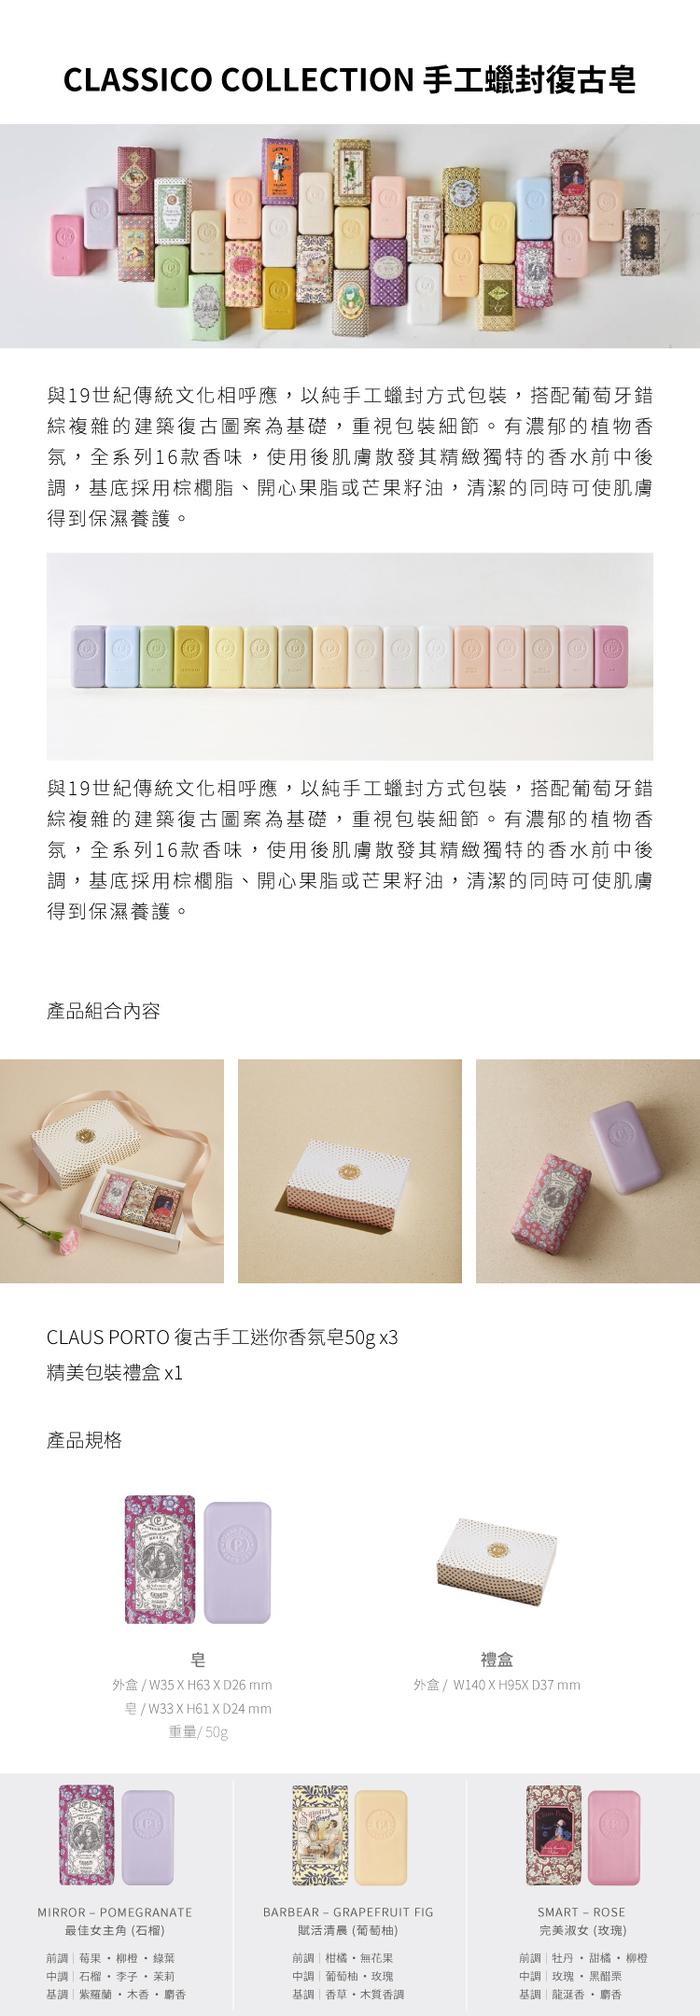 CLAUS PORTO 復古手工迷你經典香氛皂禮盒 50g x 3入